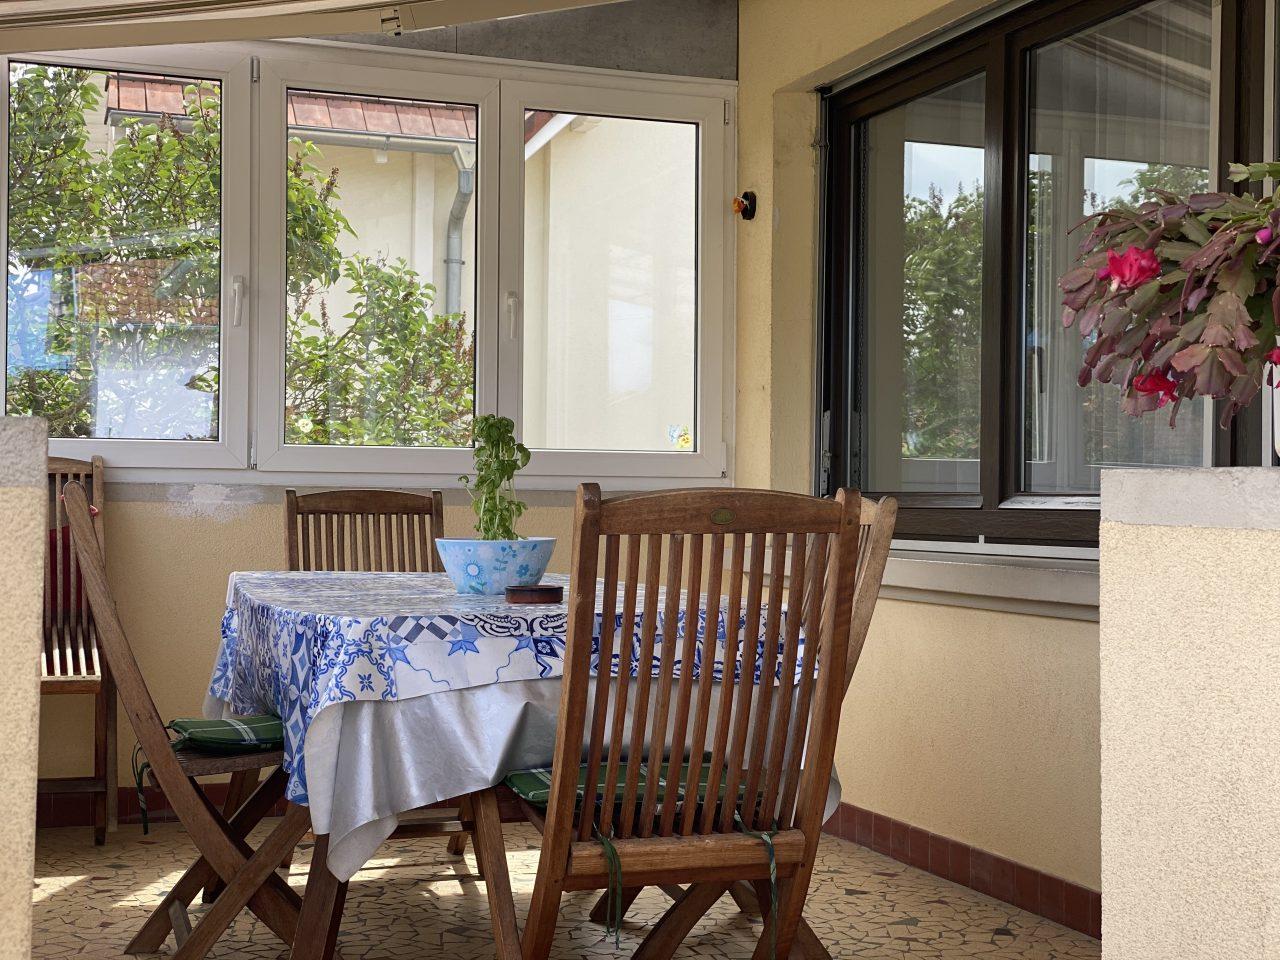 maison vente haguenau terrasse